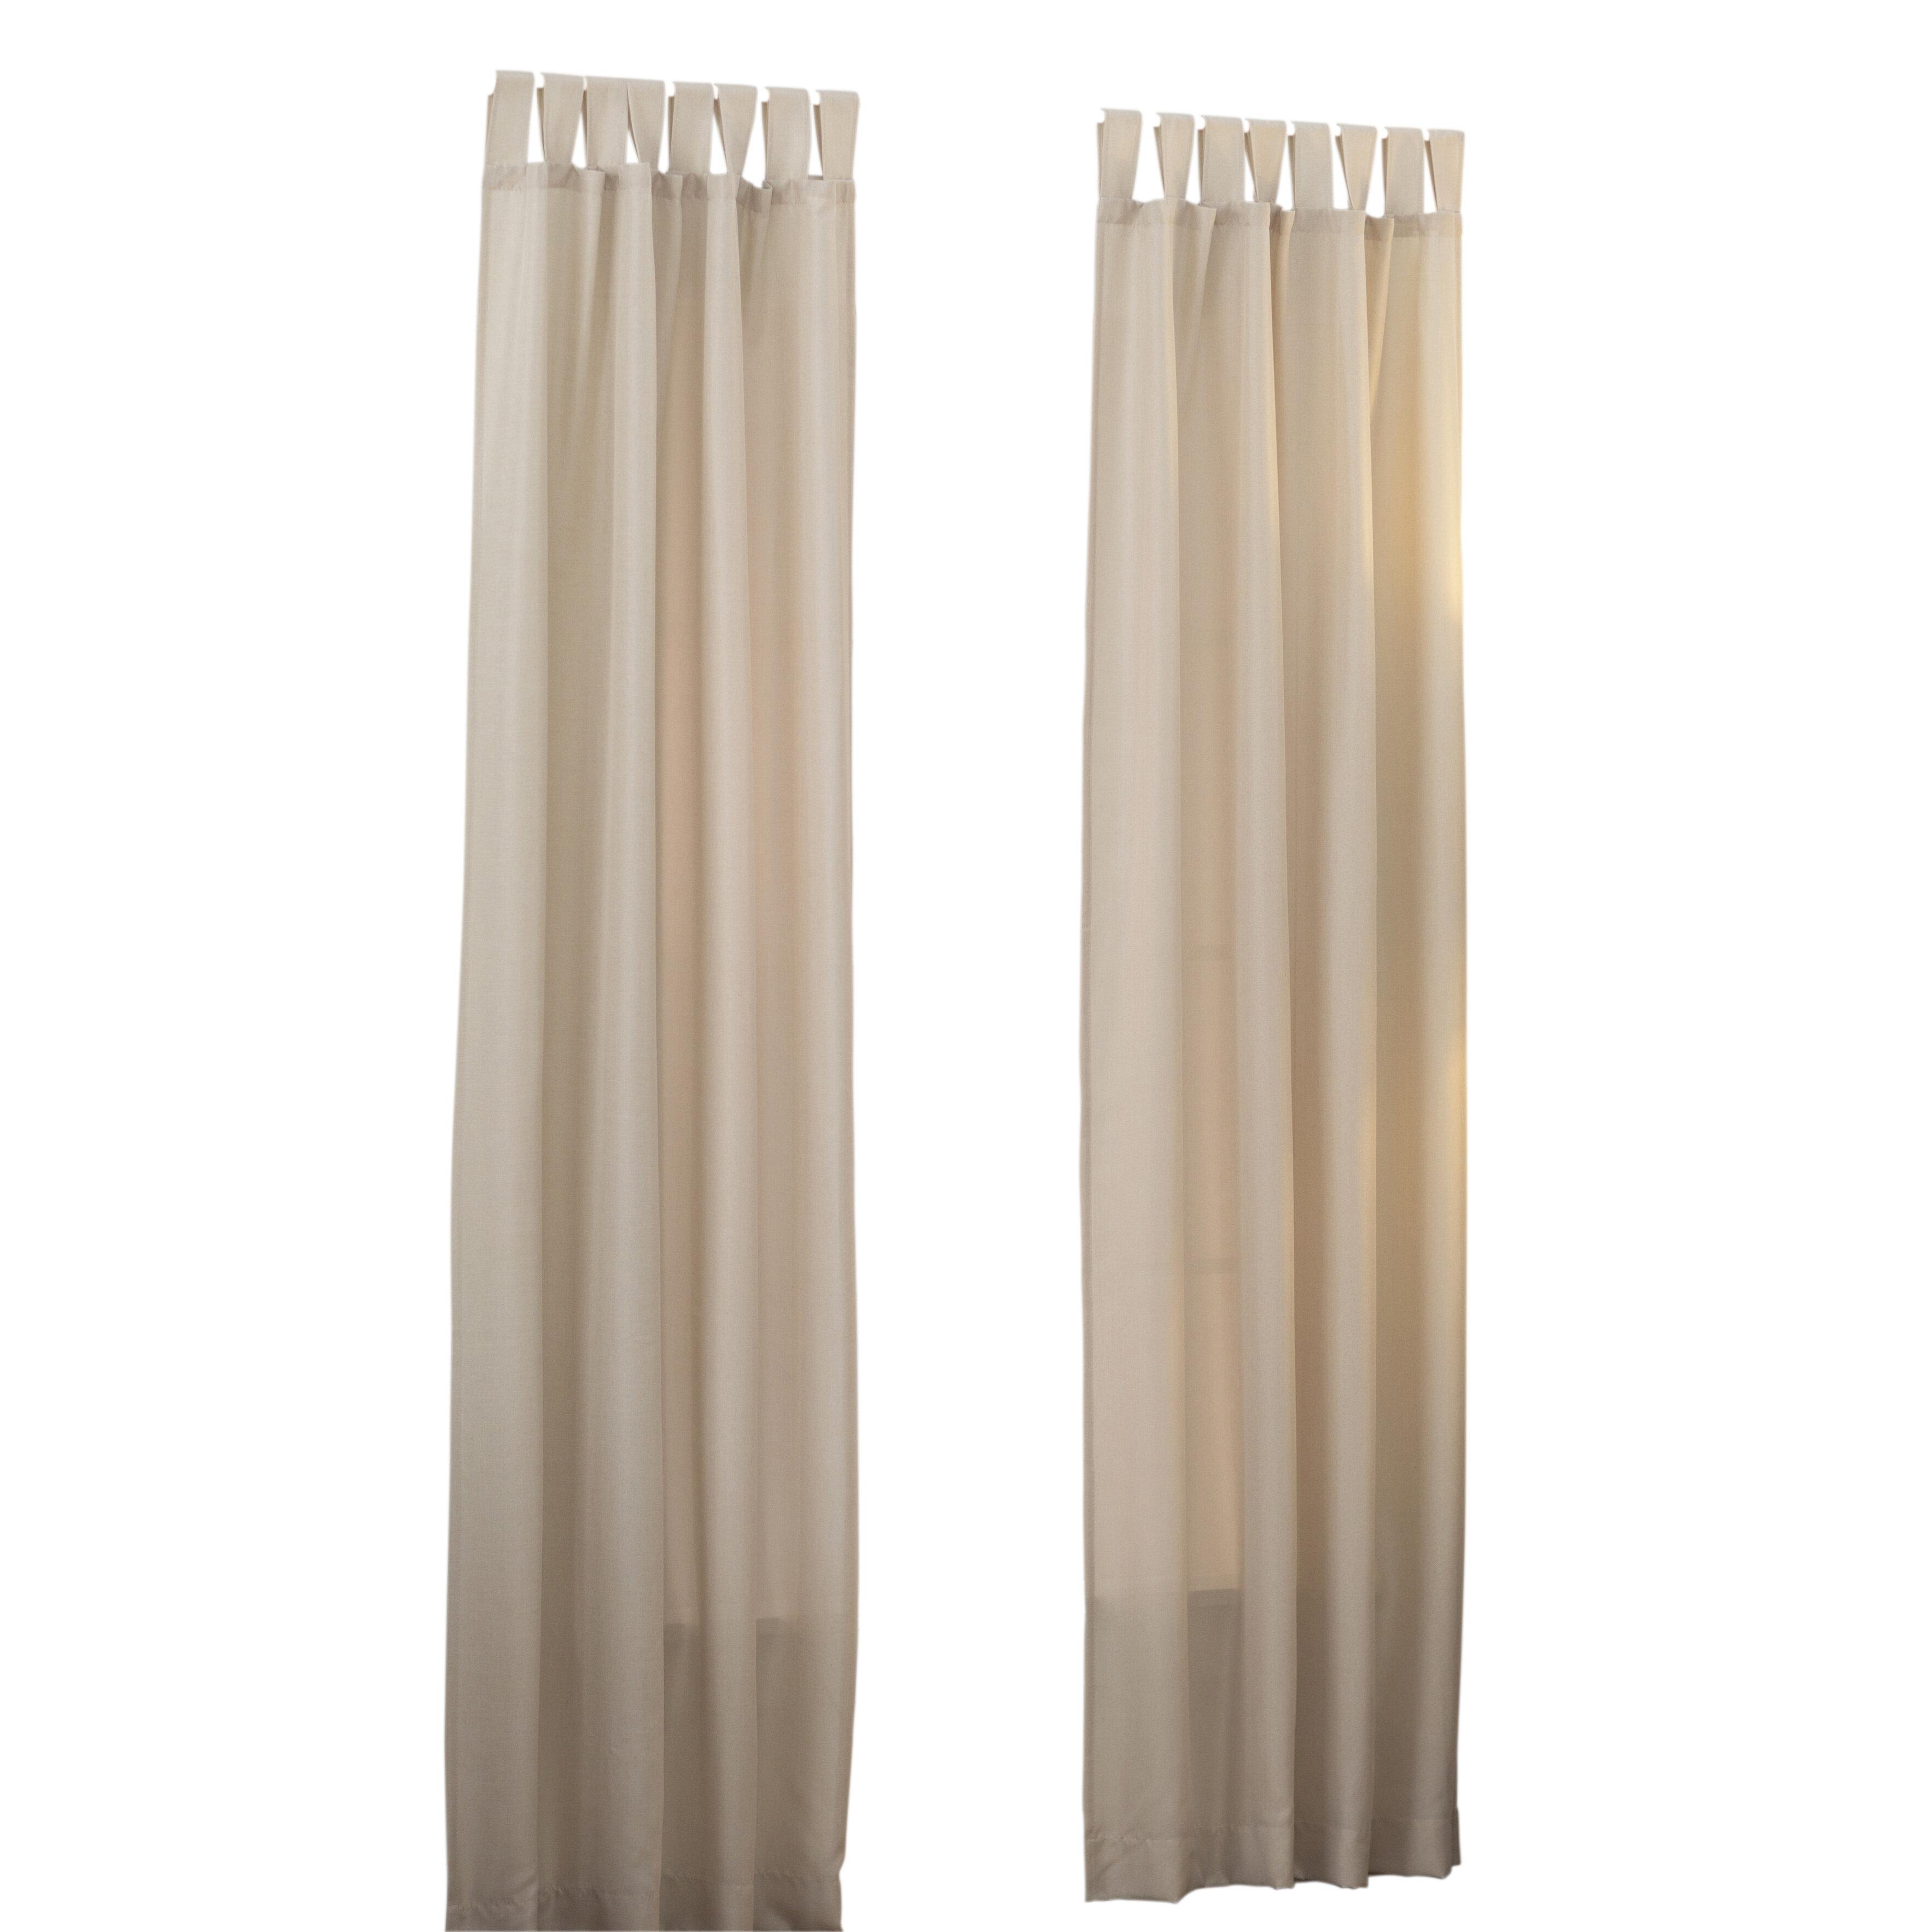 Wayfair Basics Solid Semi Sheer Tab Top Single Curtain Panel Intended For Tab Top Sheer Single Curtain Panels (View 28 of 30)